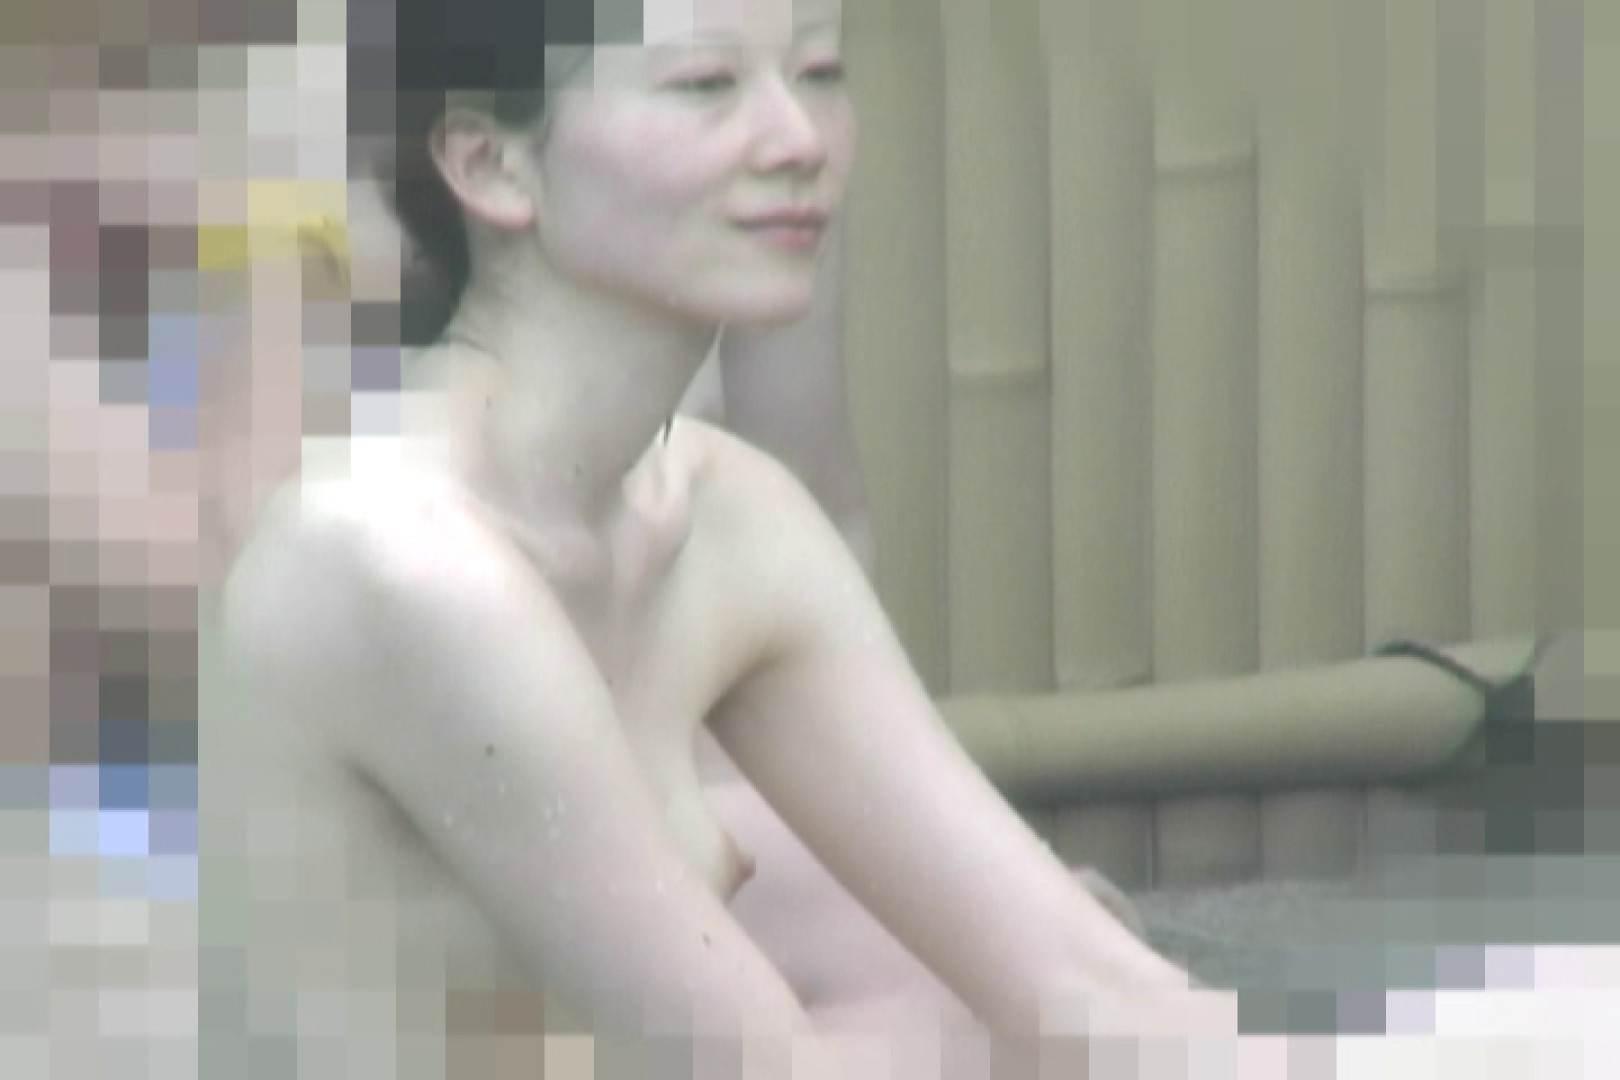 Aquaな露天風呂Vol.835 盗撮 | HなOL  73pic 49